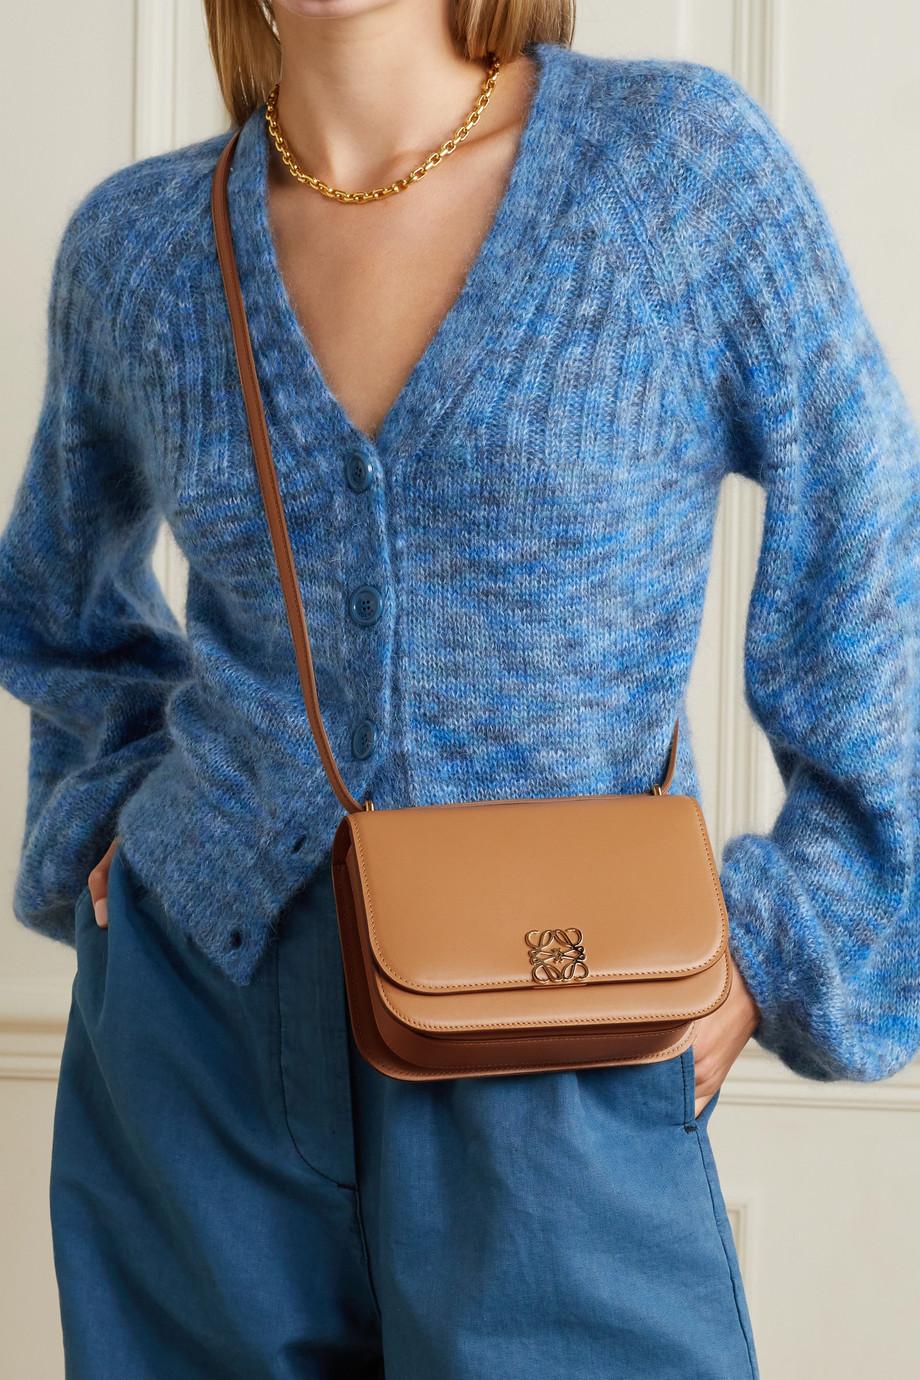 Loewe Goya small leather shoulder bag